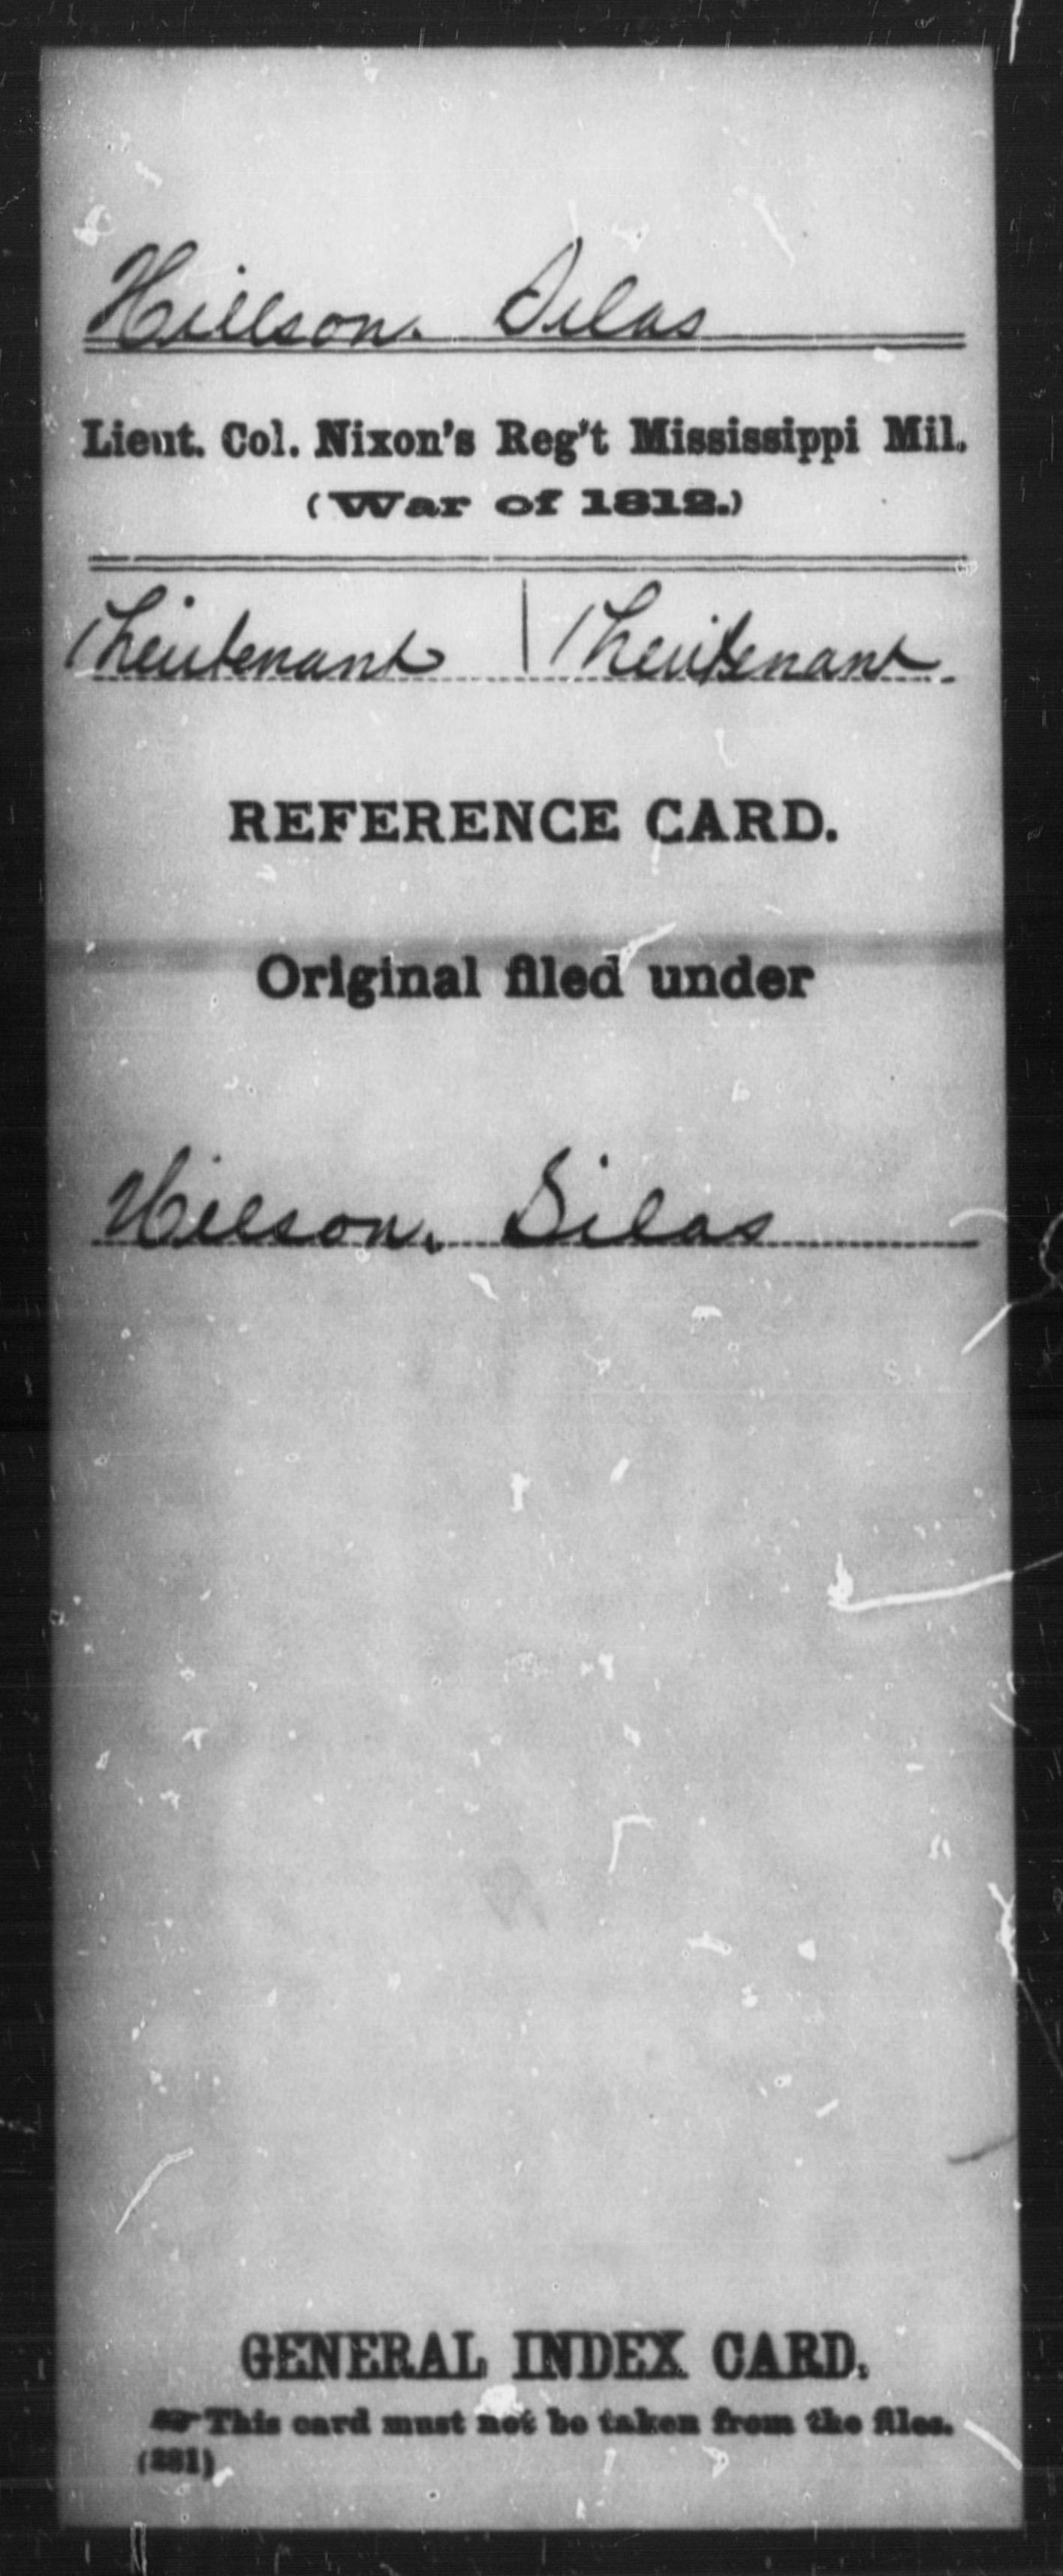 Hillson, Selas - State: Mississippi - Regiment: Lieut Col Nixon's Mississippi Mil